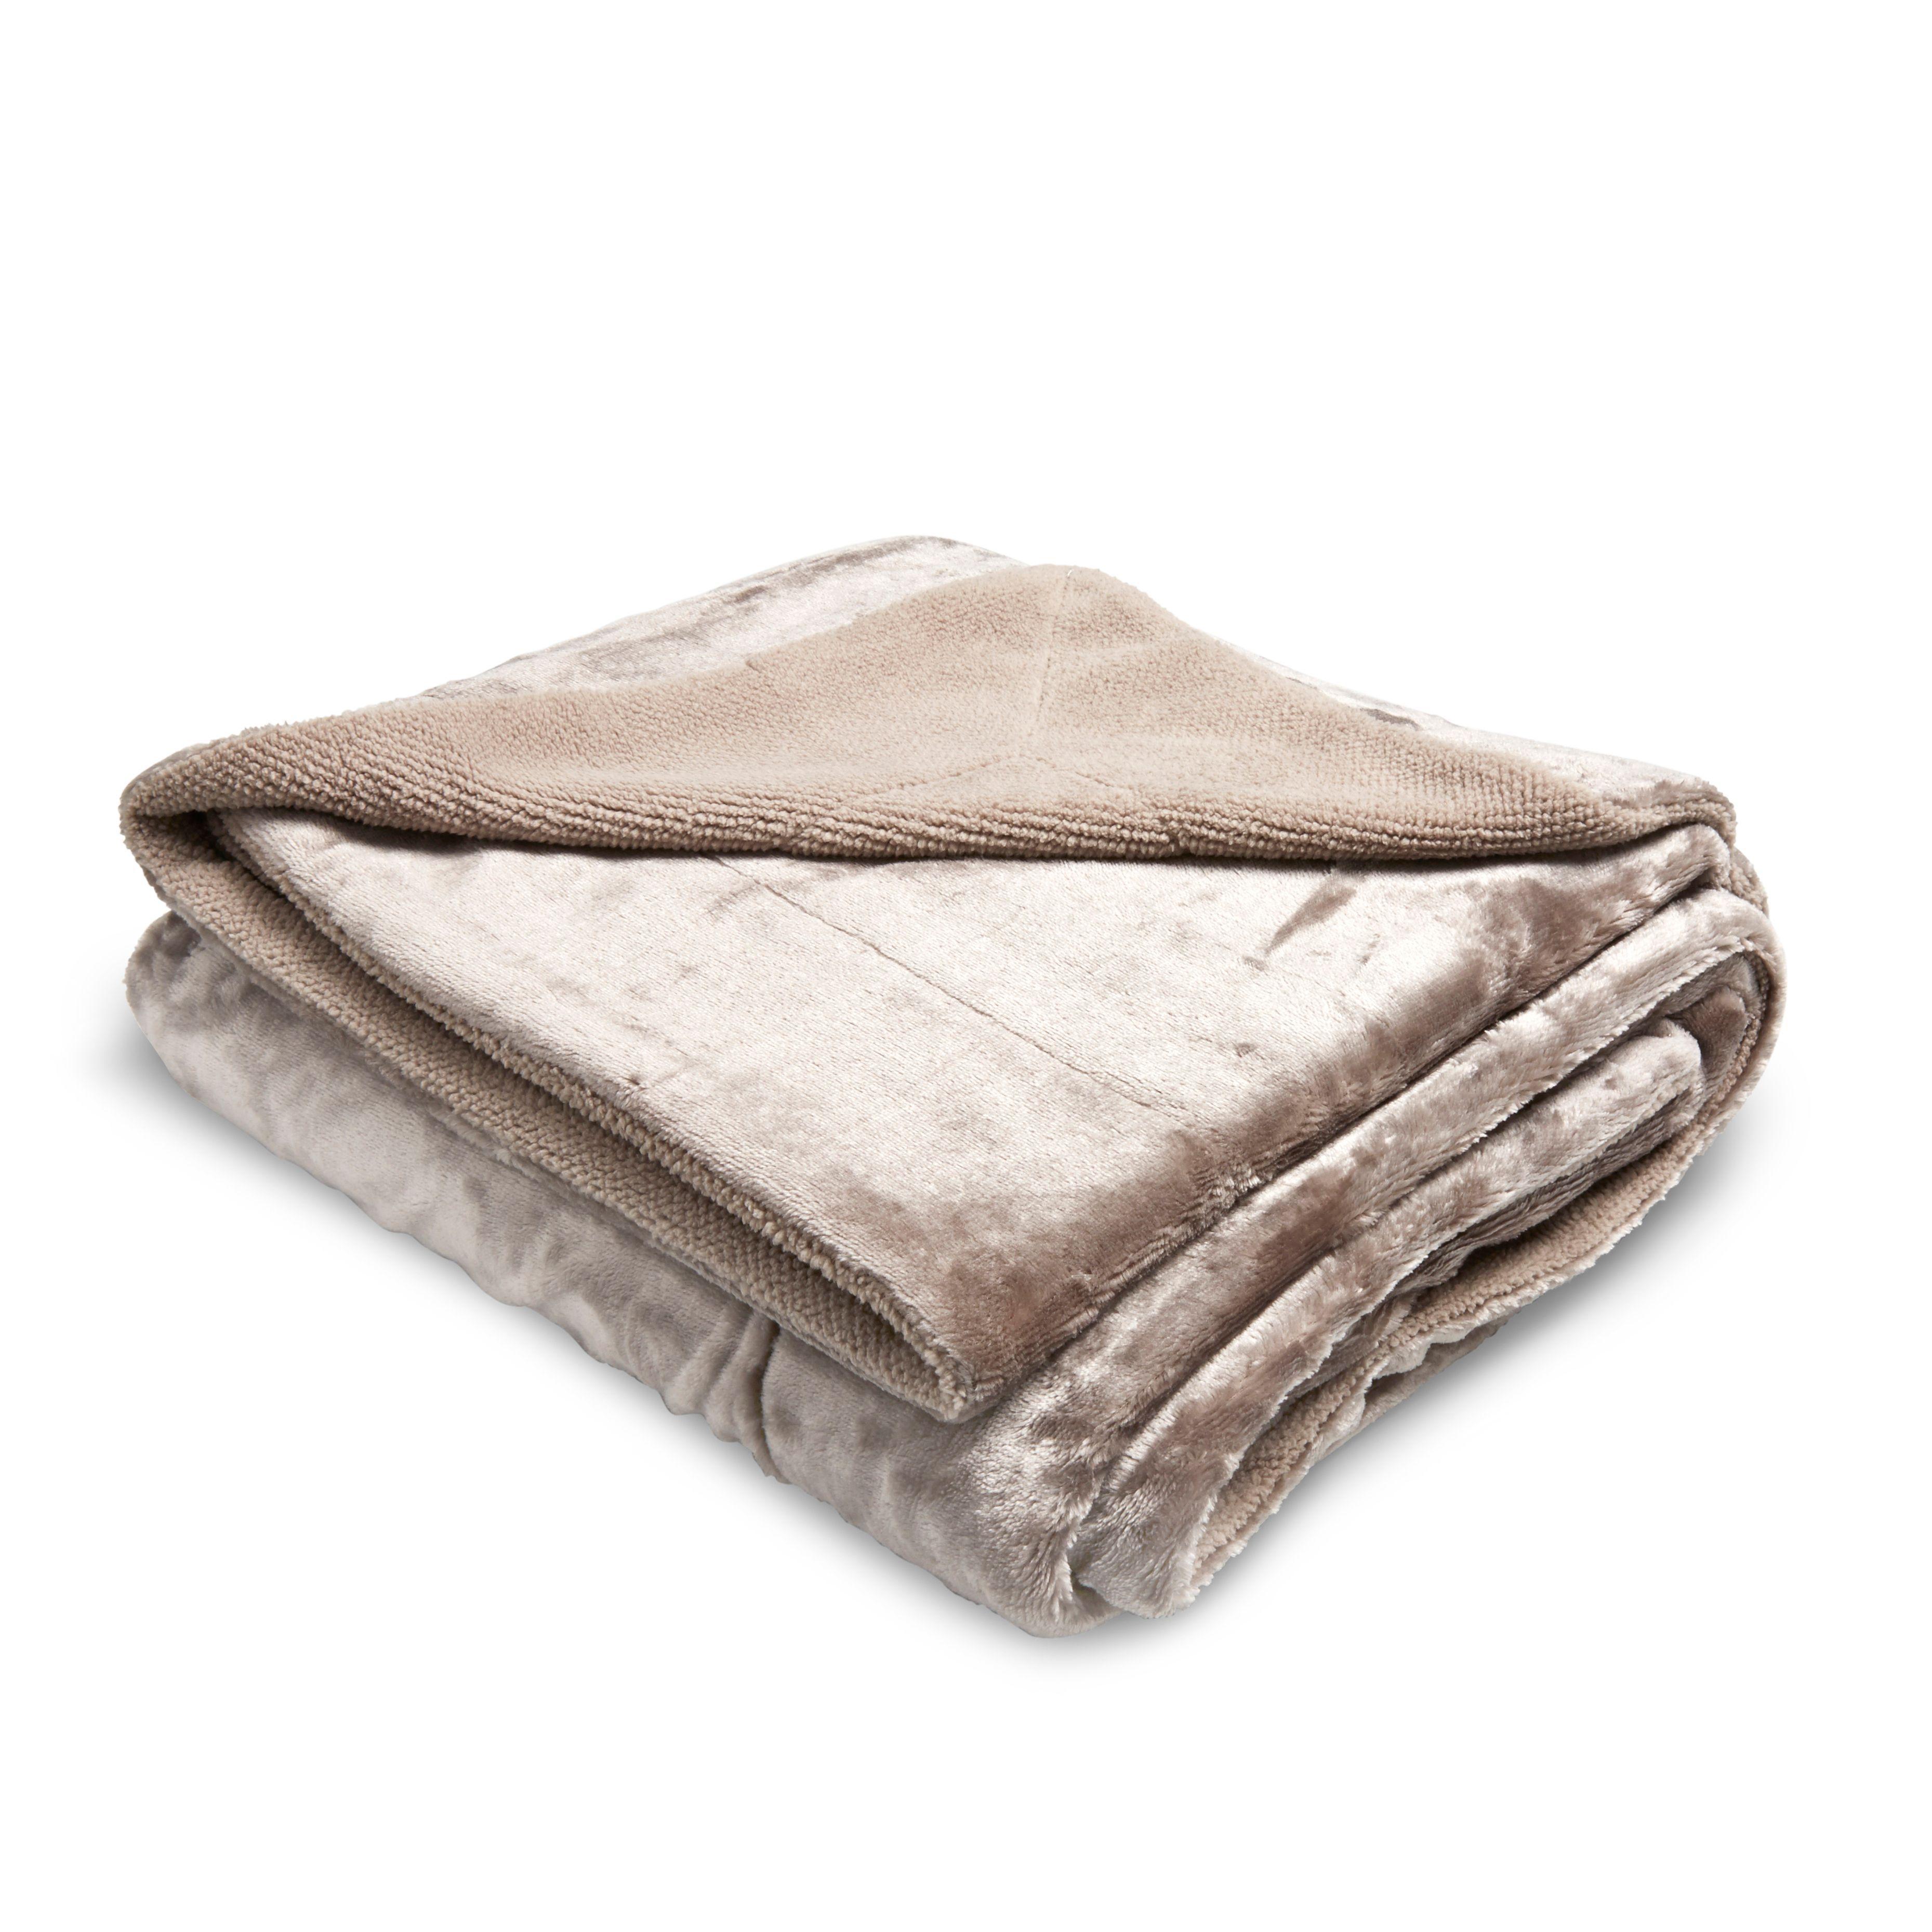 Taupe Honeycomb Fleece Throw Departments Diy At B Amp Q